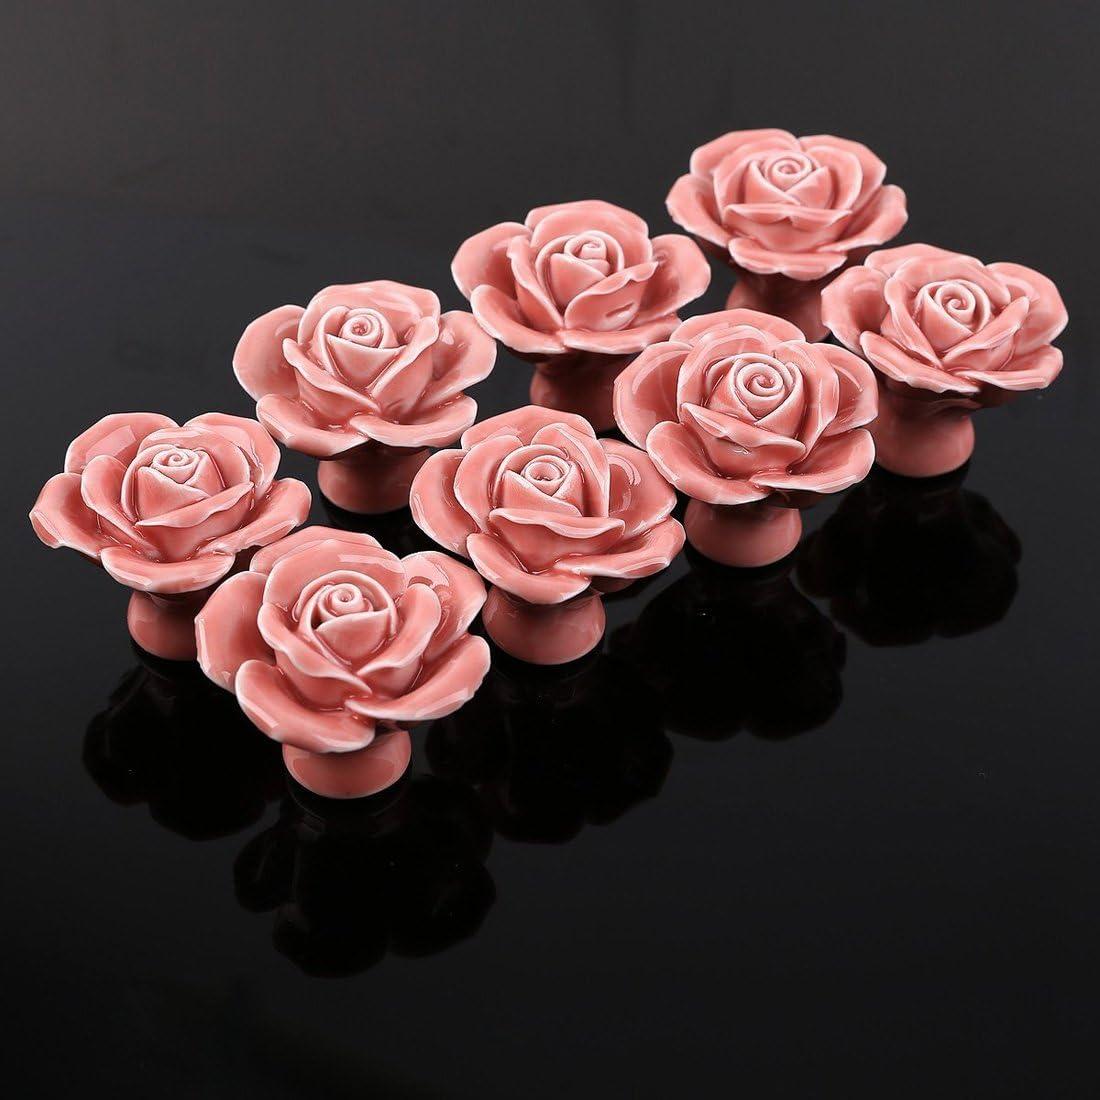 Haunen Haunen Ceramic Handle Pull Knobs Set of 8 Rose Flower Ceramic Door Knobs Drawer Cupboard Pulls Handles for Home Decor